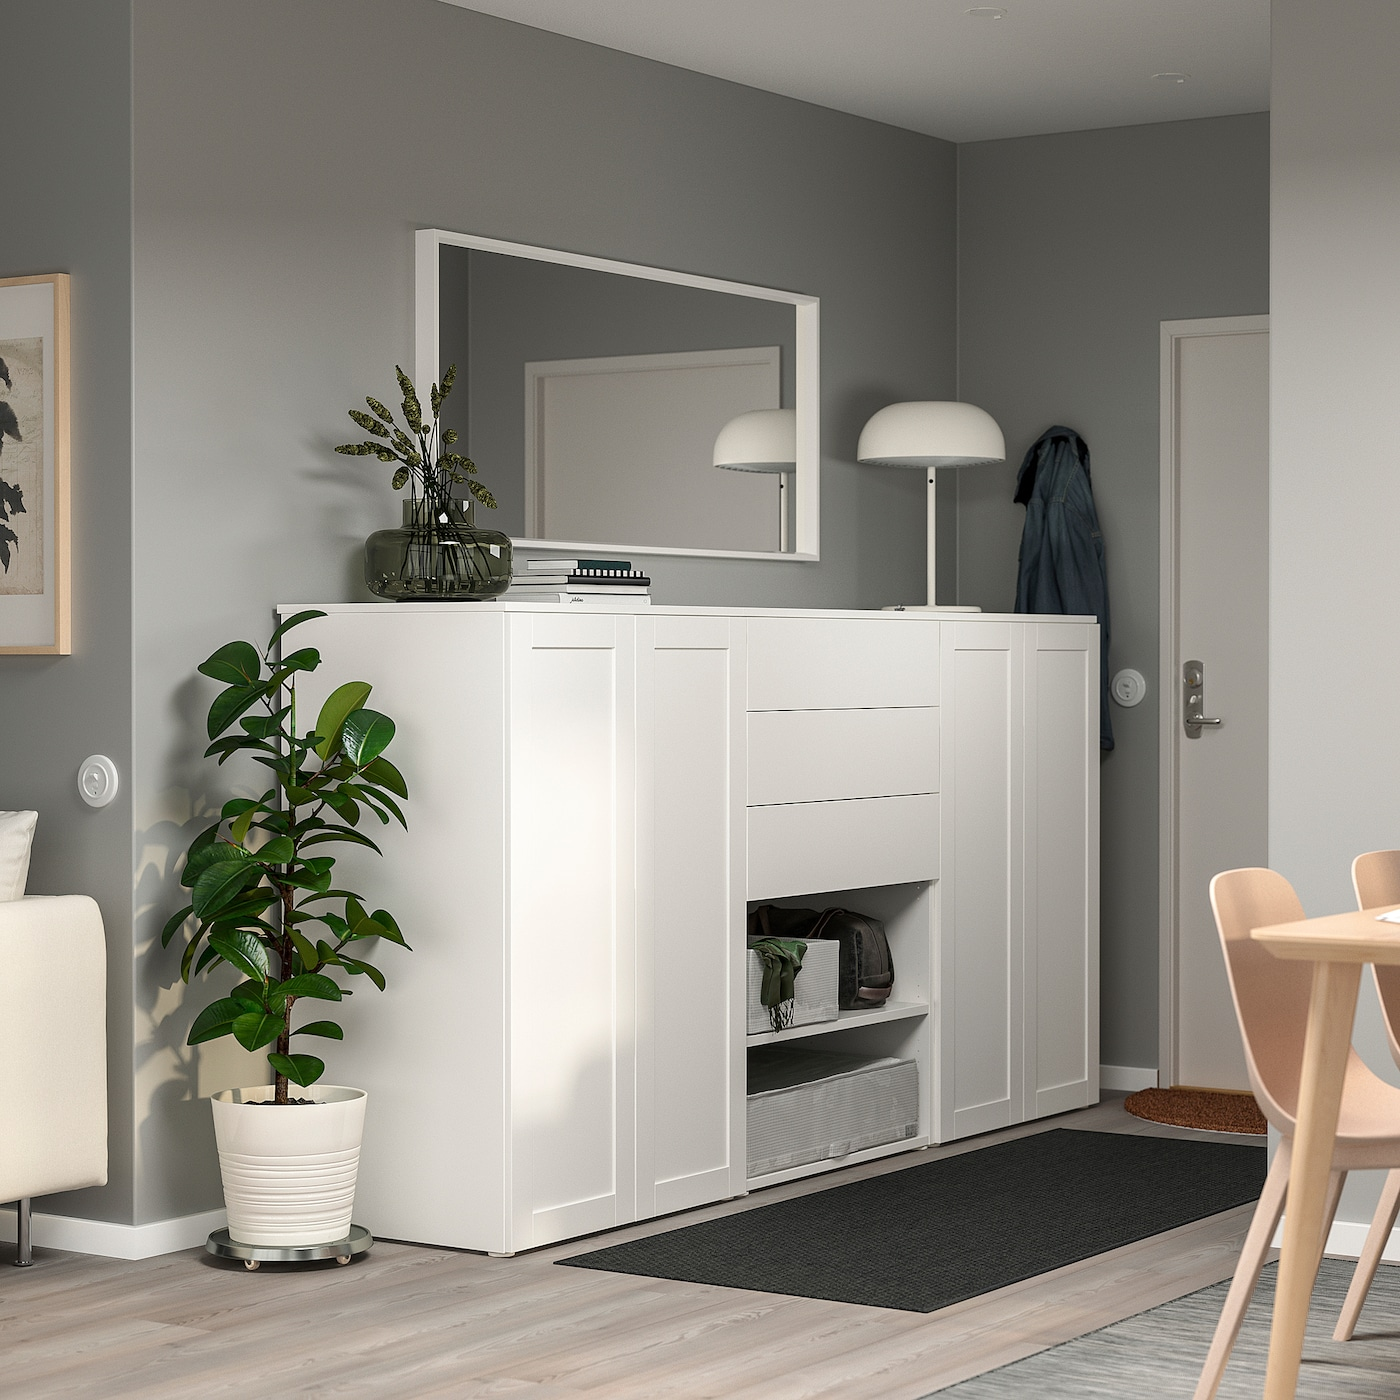 PLATSA دولاب ملابس, أبيض/Fonnes Sannidal, 240x57x123 سم